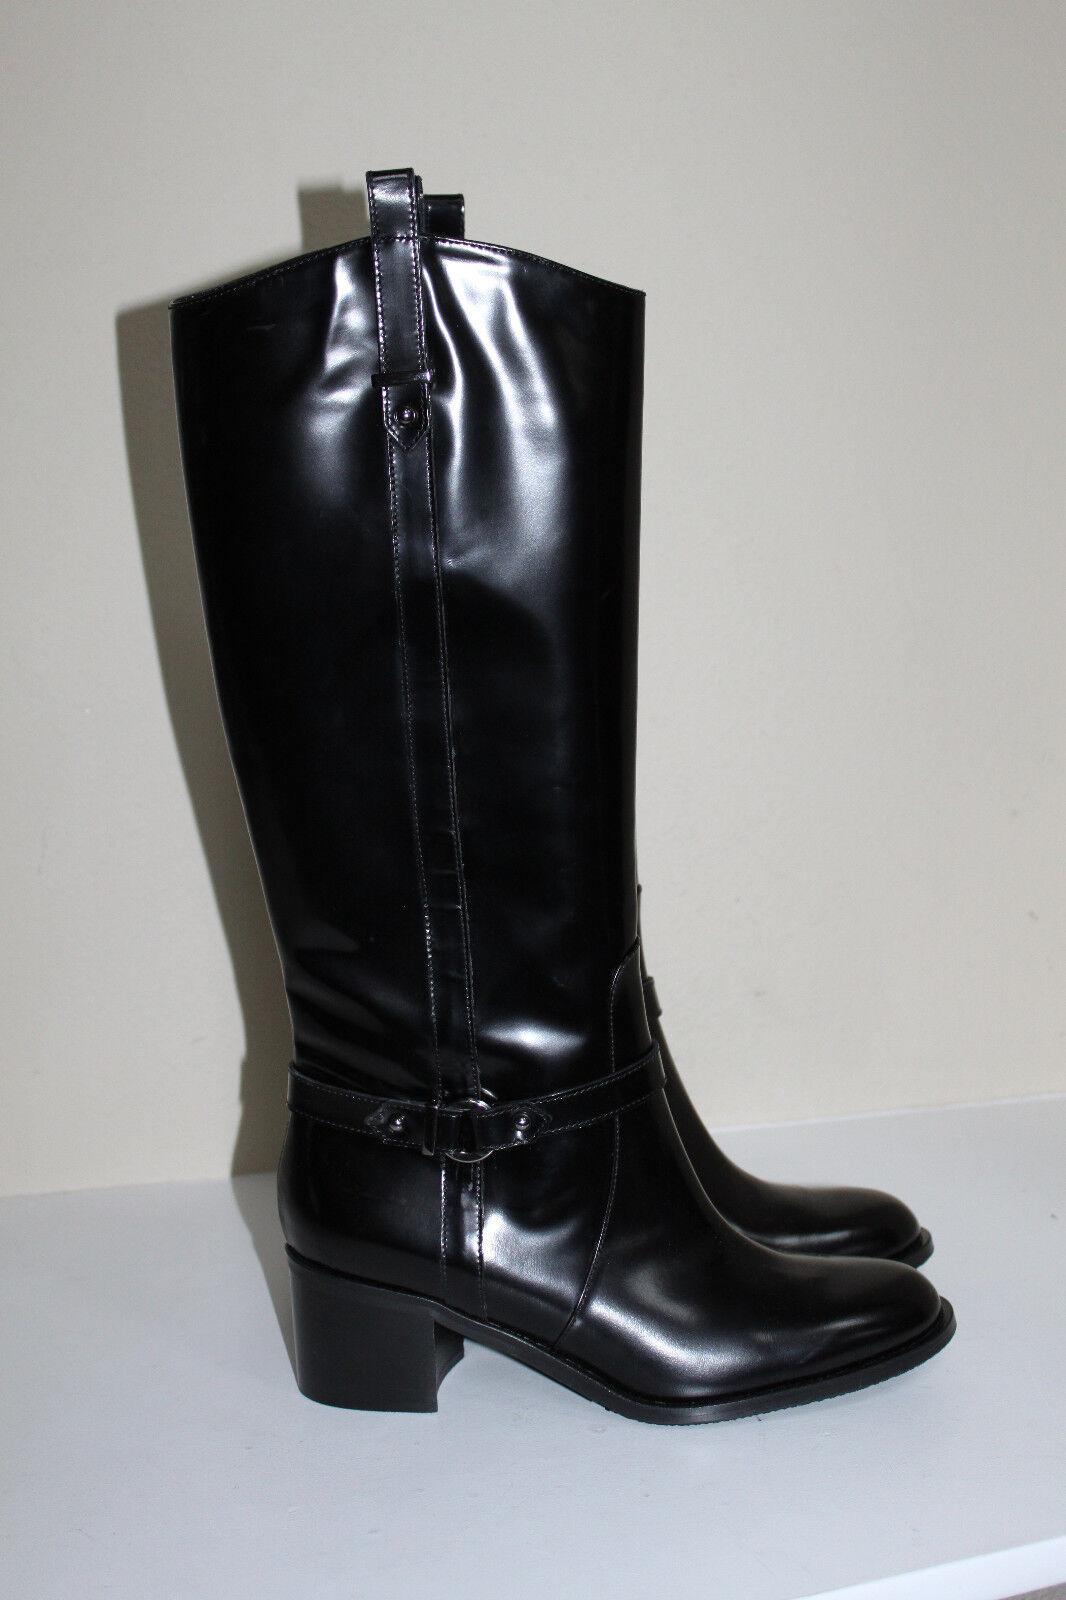 New sz 8.5 38.5 Aquatalia by Marvin K Opulence Black Leather Tall Boot Heel Shoe